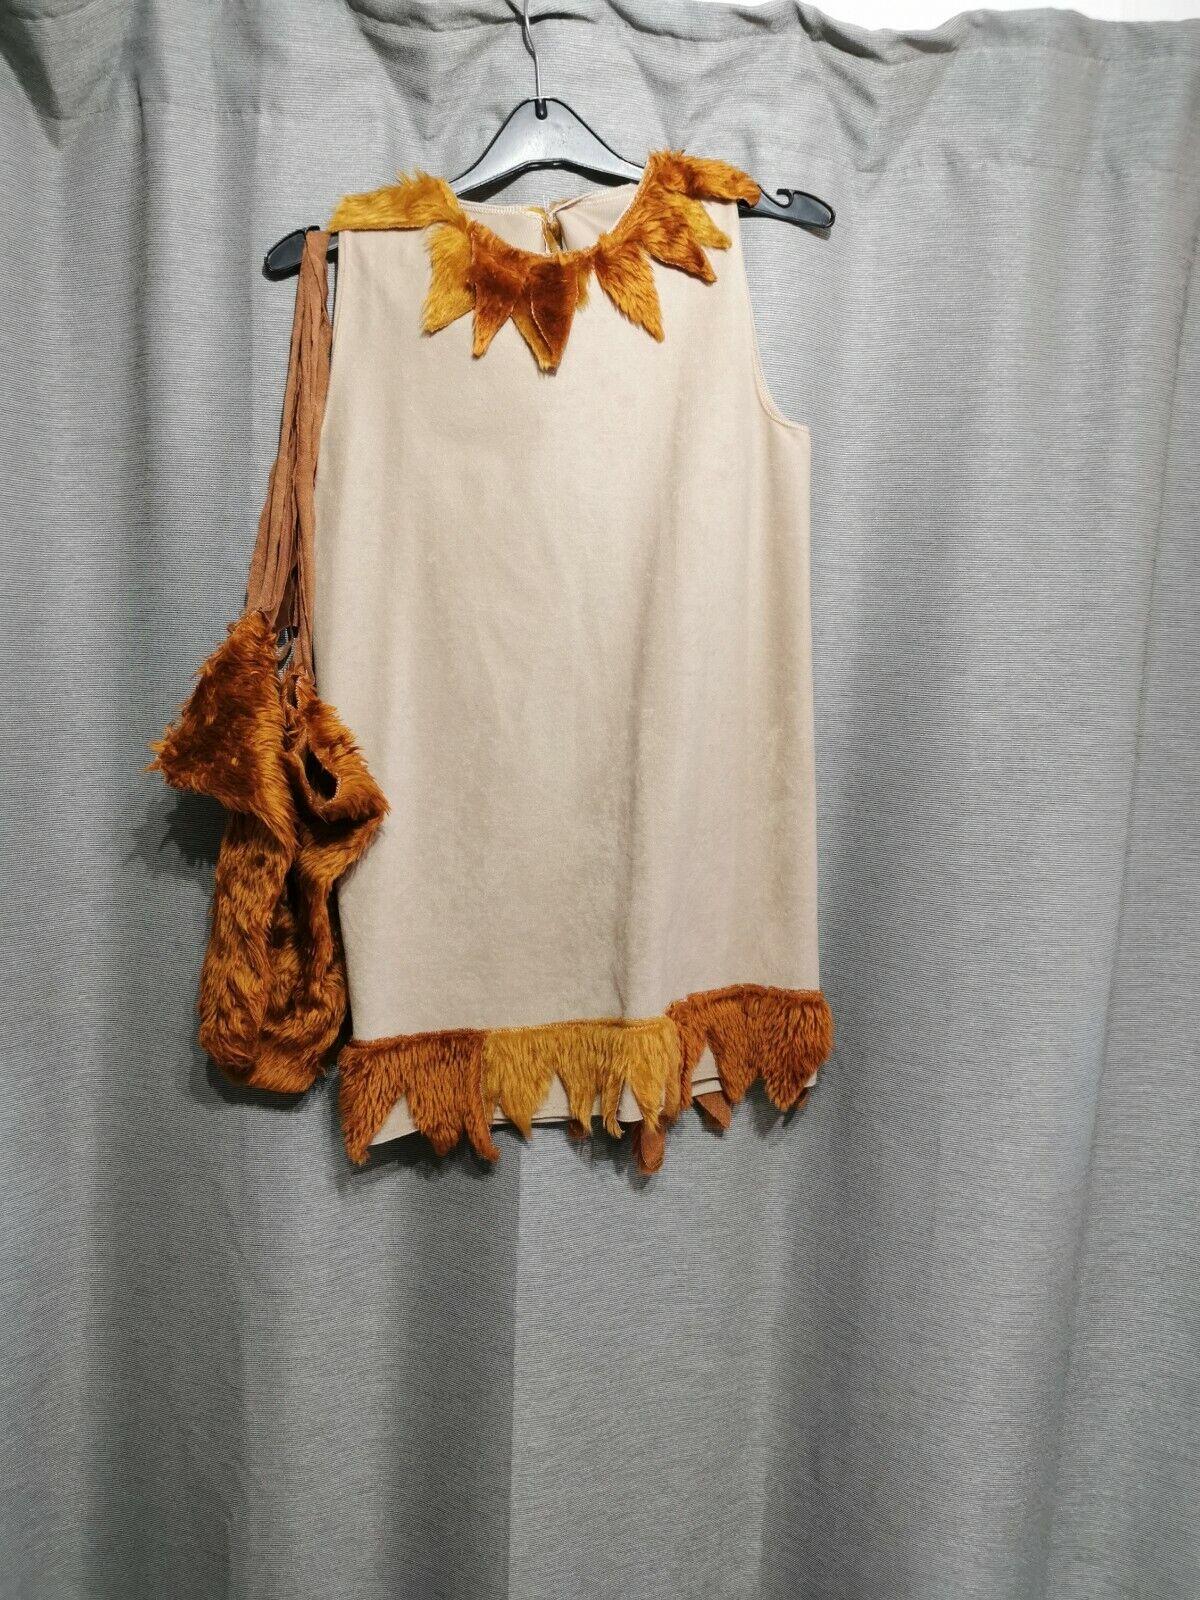 F29 handmade girls apache Indian fancy dress costume top/dress 28